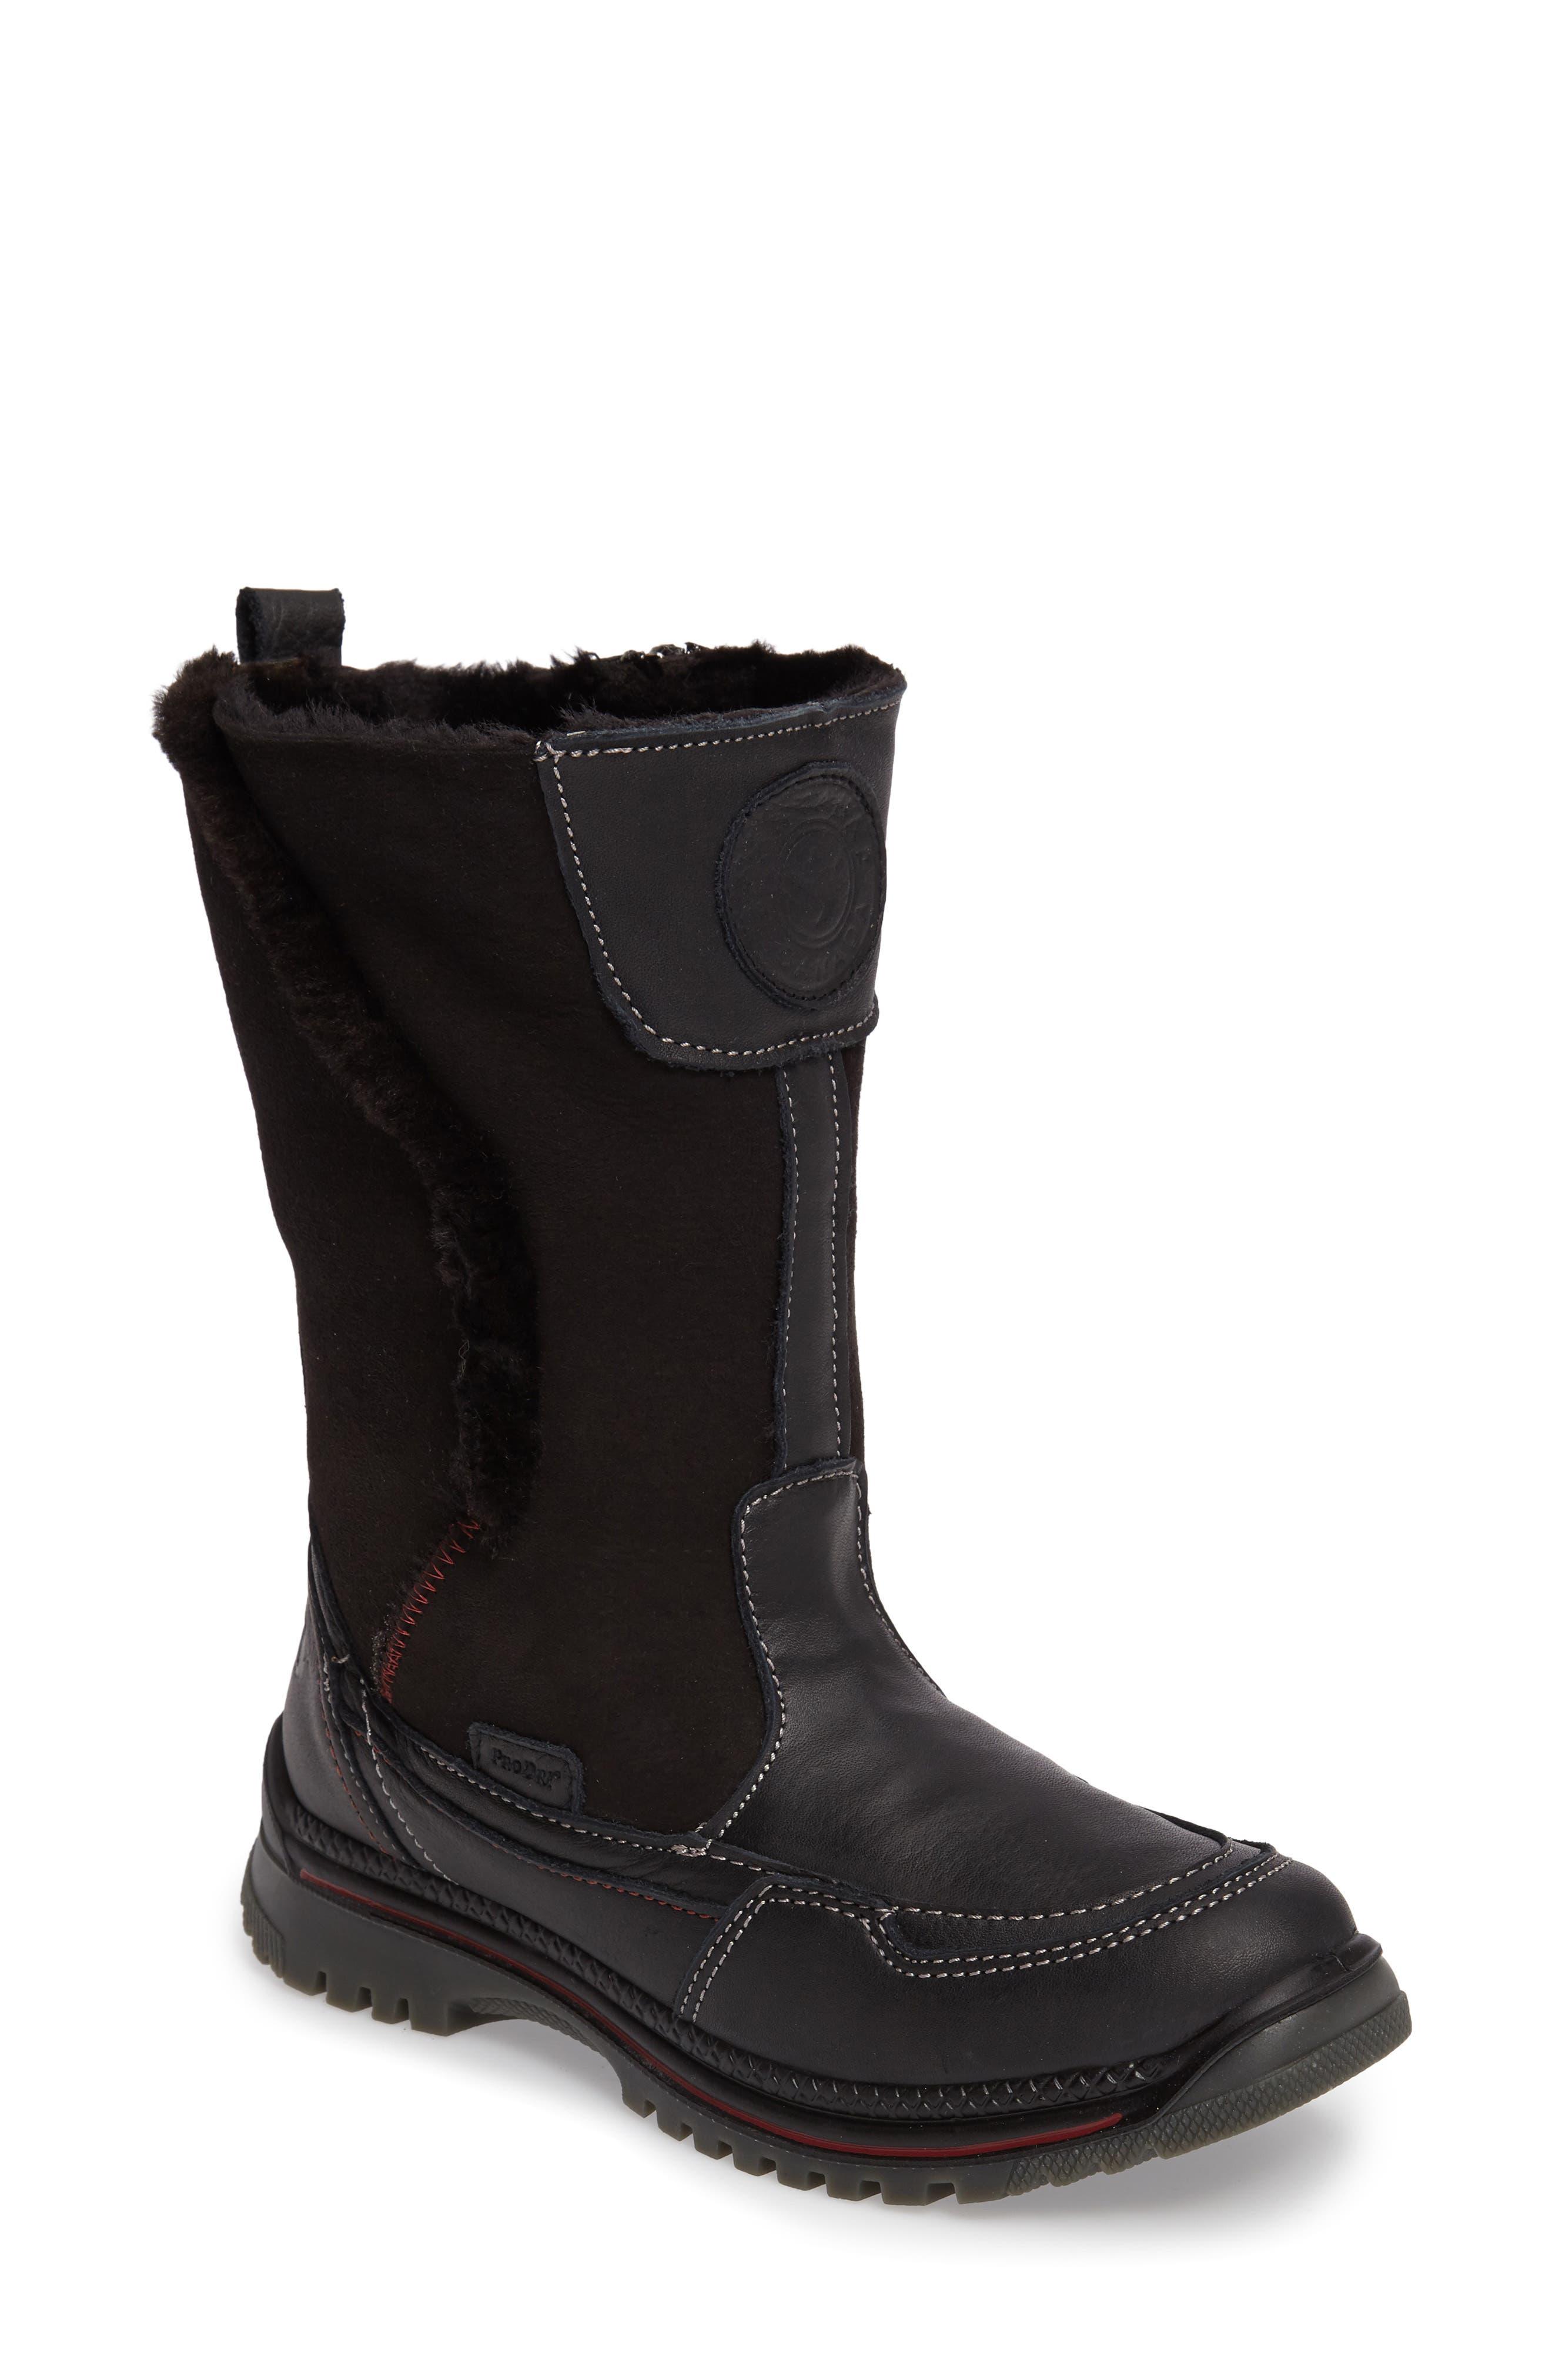 Seraphine Genuine Shearling Waterproof Winter Boot,                             Alternate thumbnail 2, color,                             001